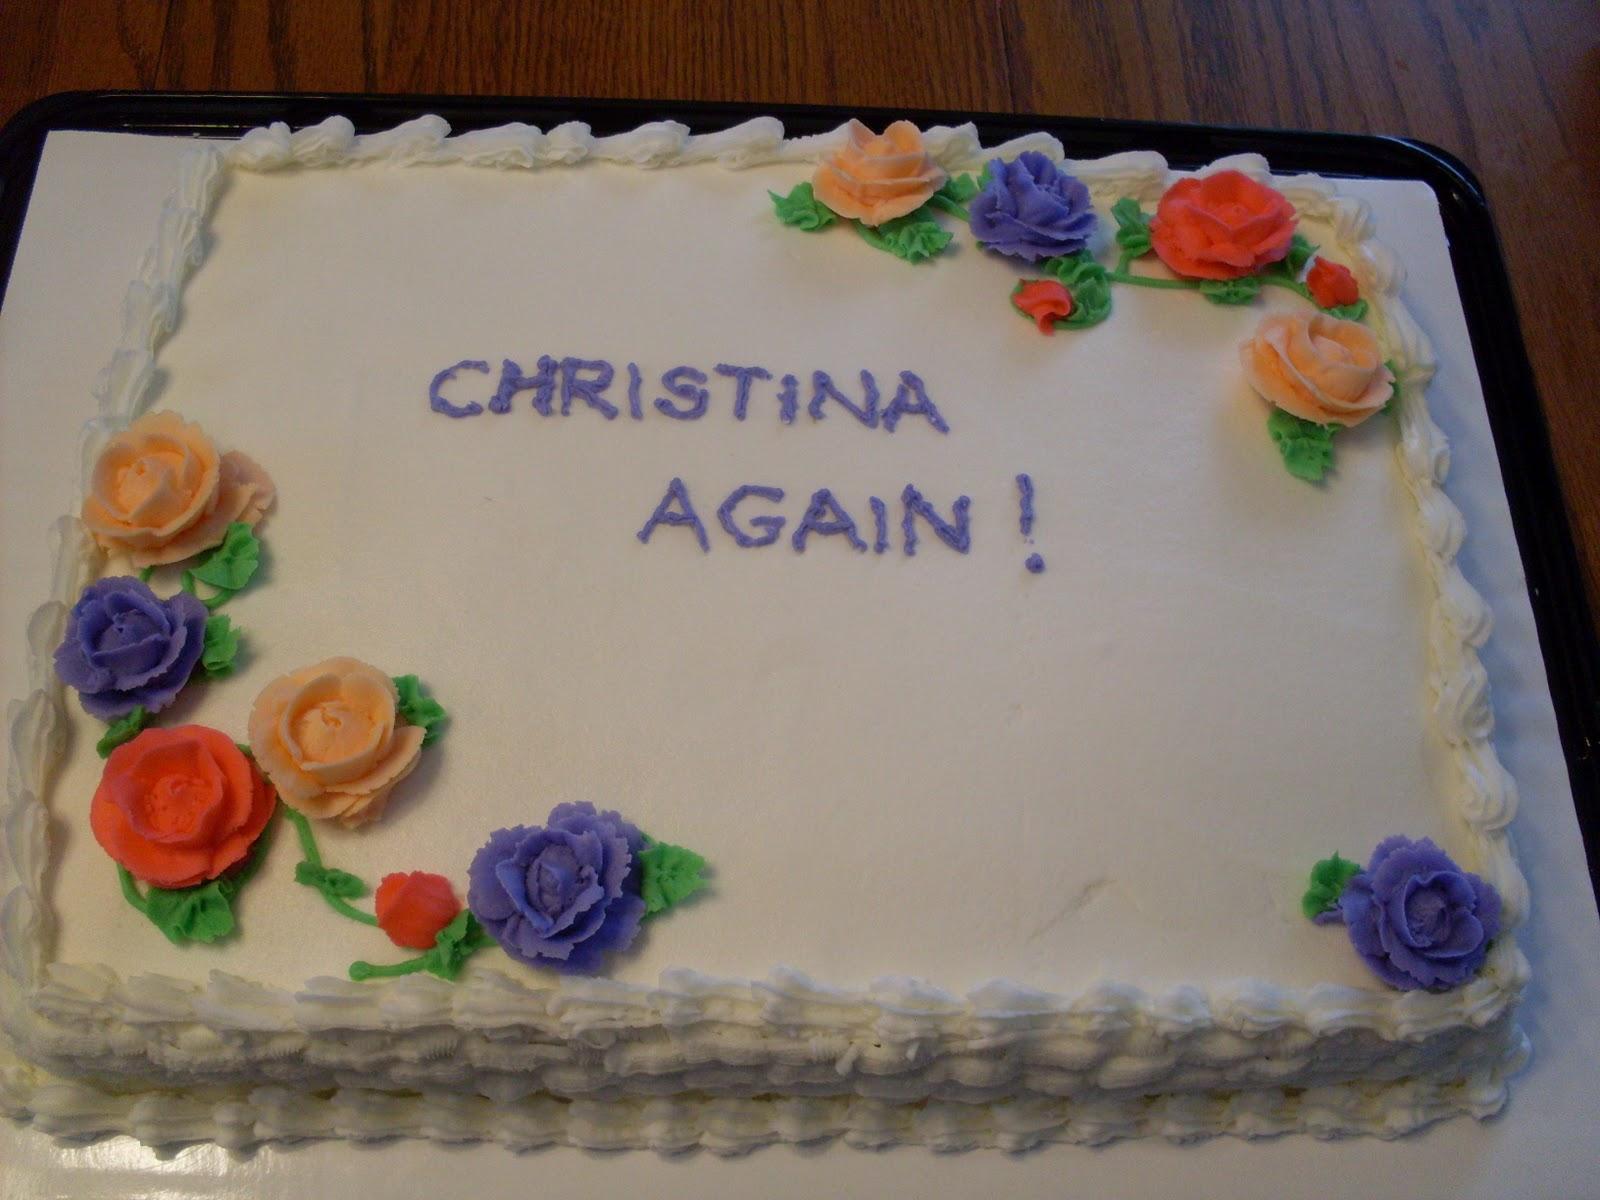 Brilliant Cakes Fit For The King Crazy Inside Joke Birthday Cake Funny Birthday Cards Online Inifodamsfinfo